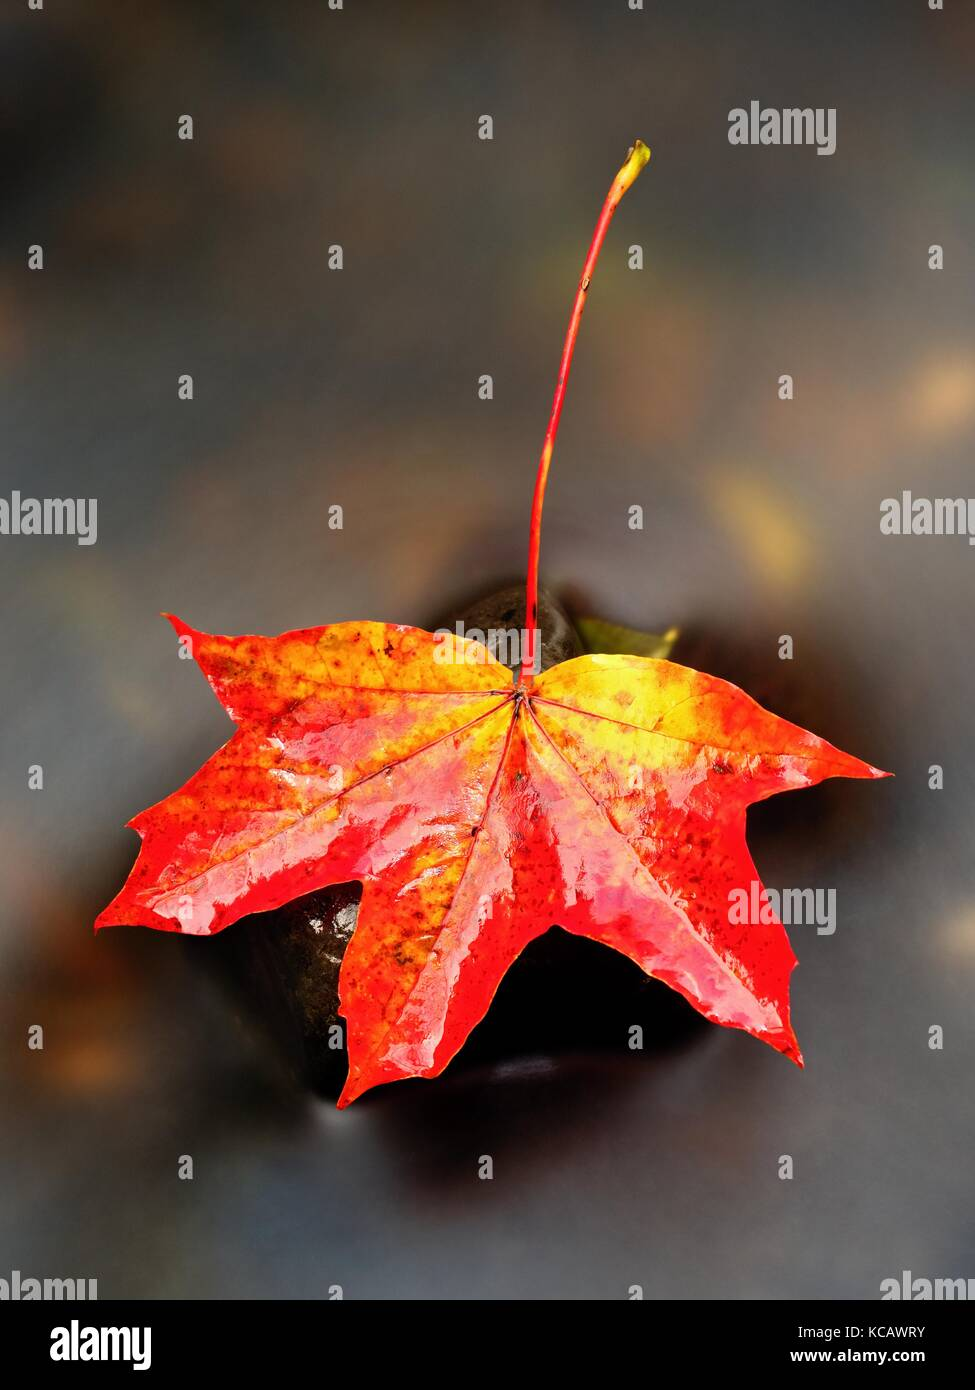 Otoño naturaleza. Detalle de Naranja podrida rojo maple leaf. caída de la hoja yacía sobre piedra Imagen De Stock